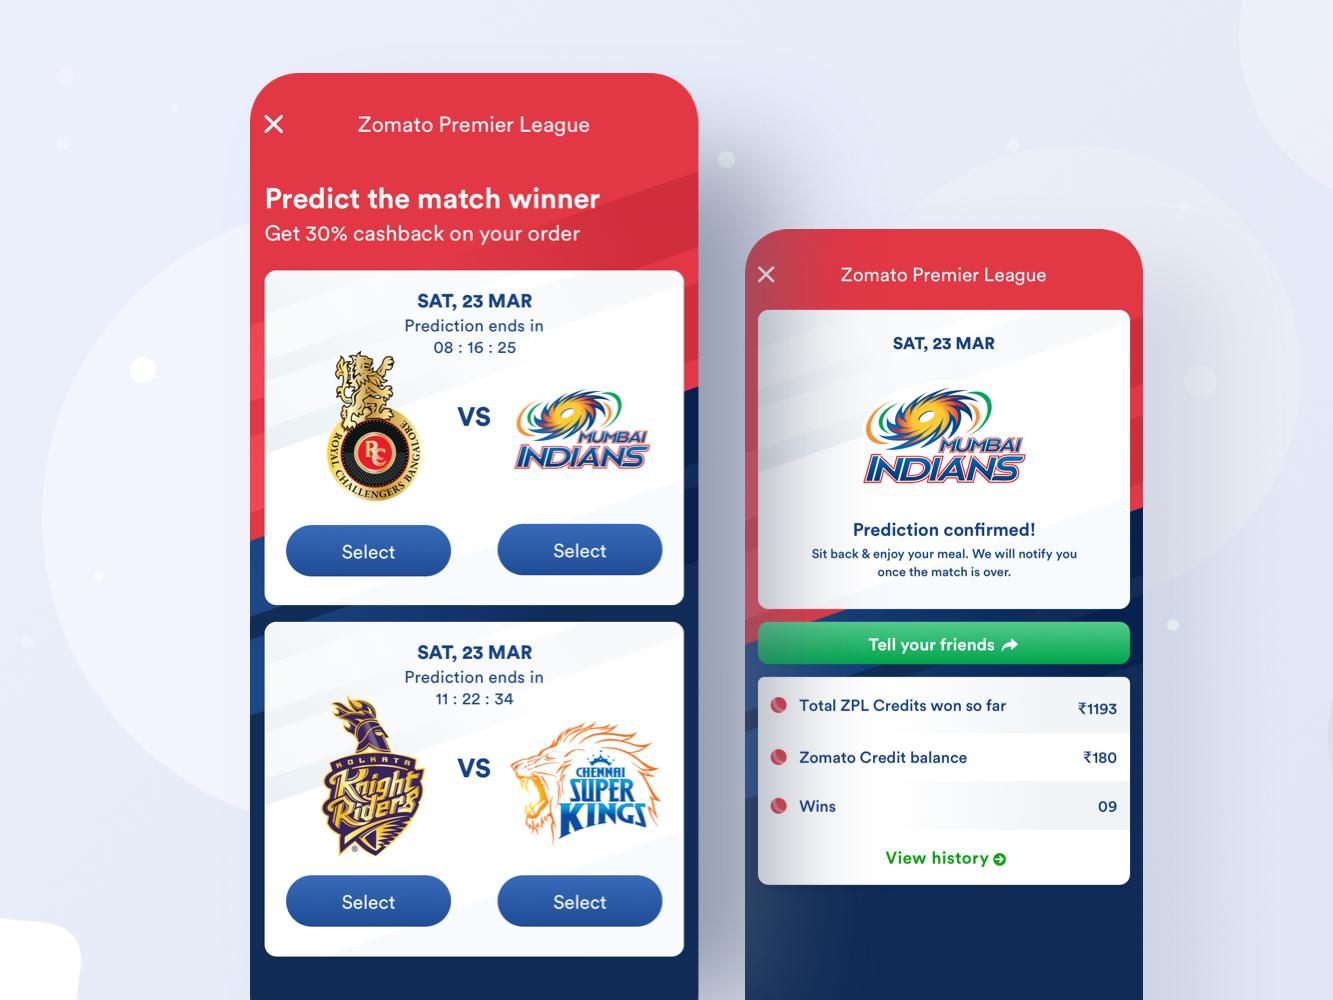 Zomato Premier League by Shoaib Prasad for Zomato on Dribbble